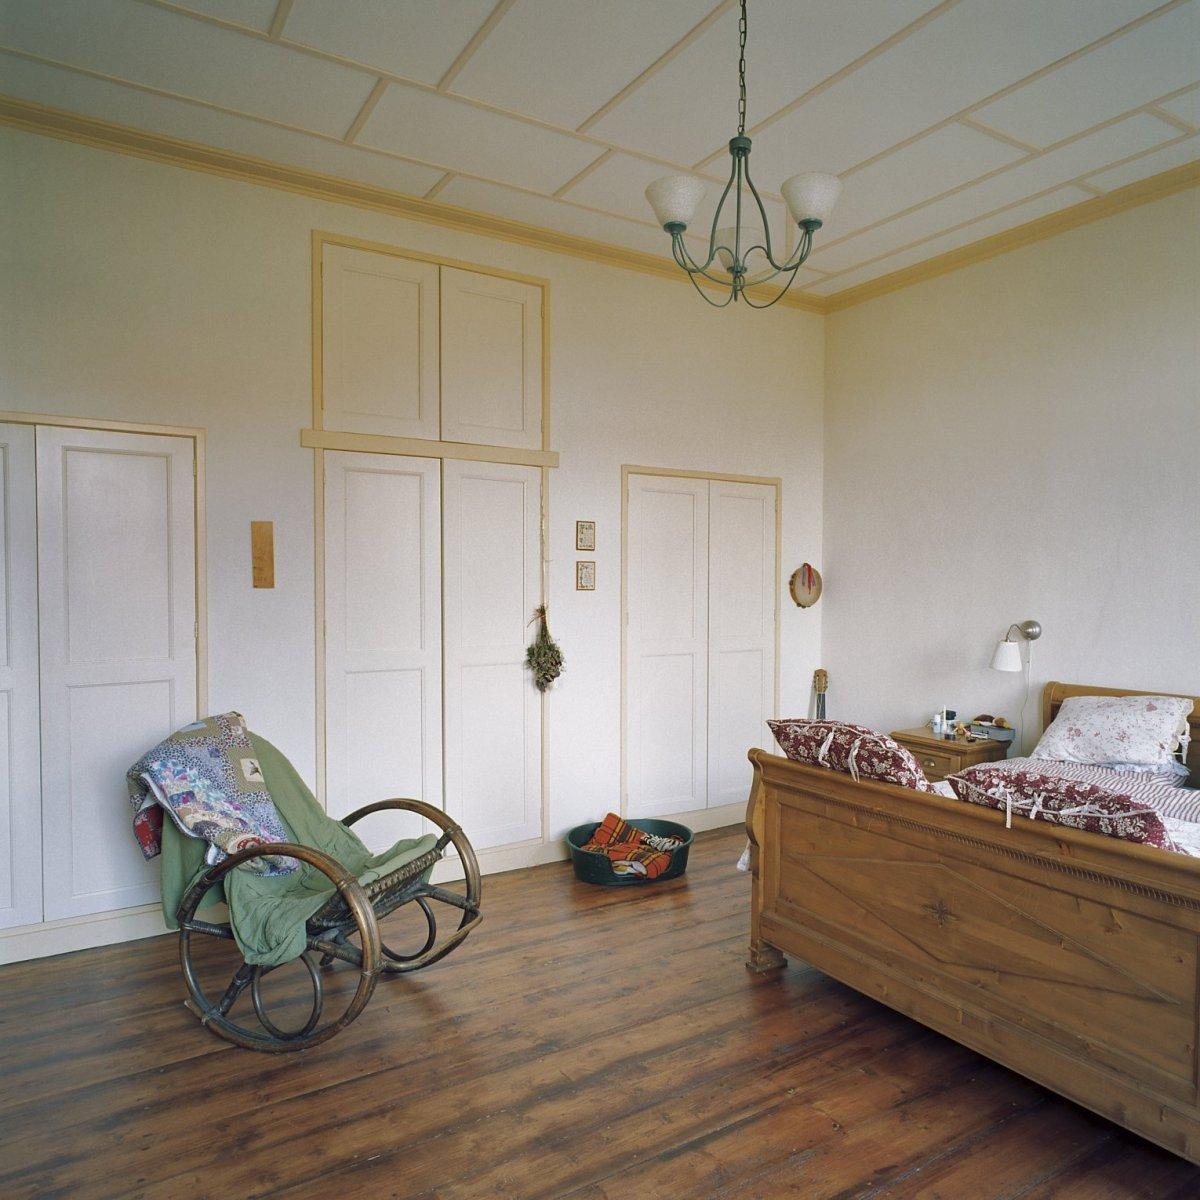 ... boerderij, oude slaapkamer met kastenwand - Wouw - 20363597 - RCE.jpg